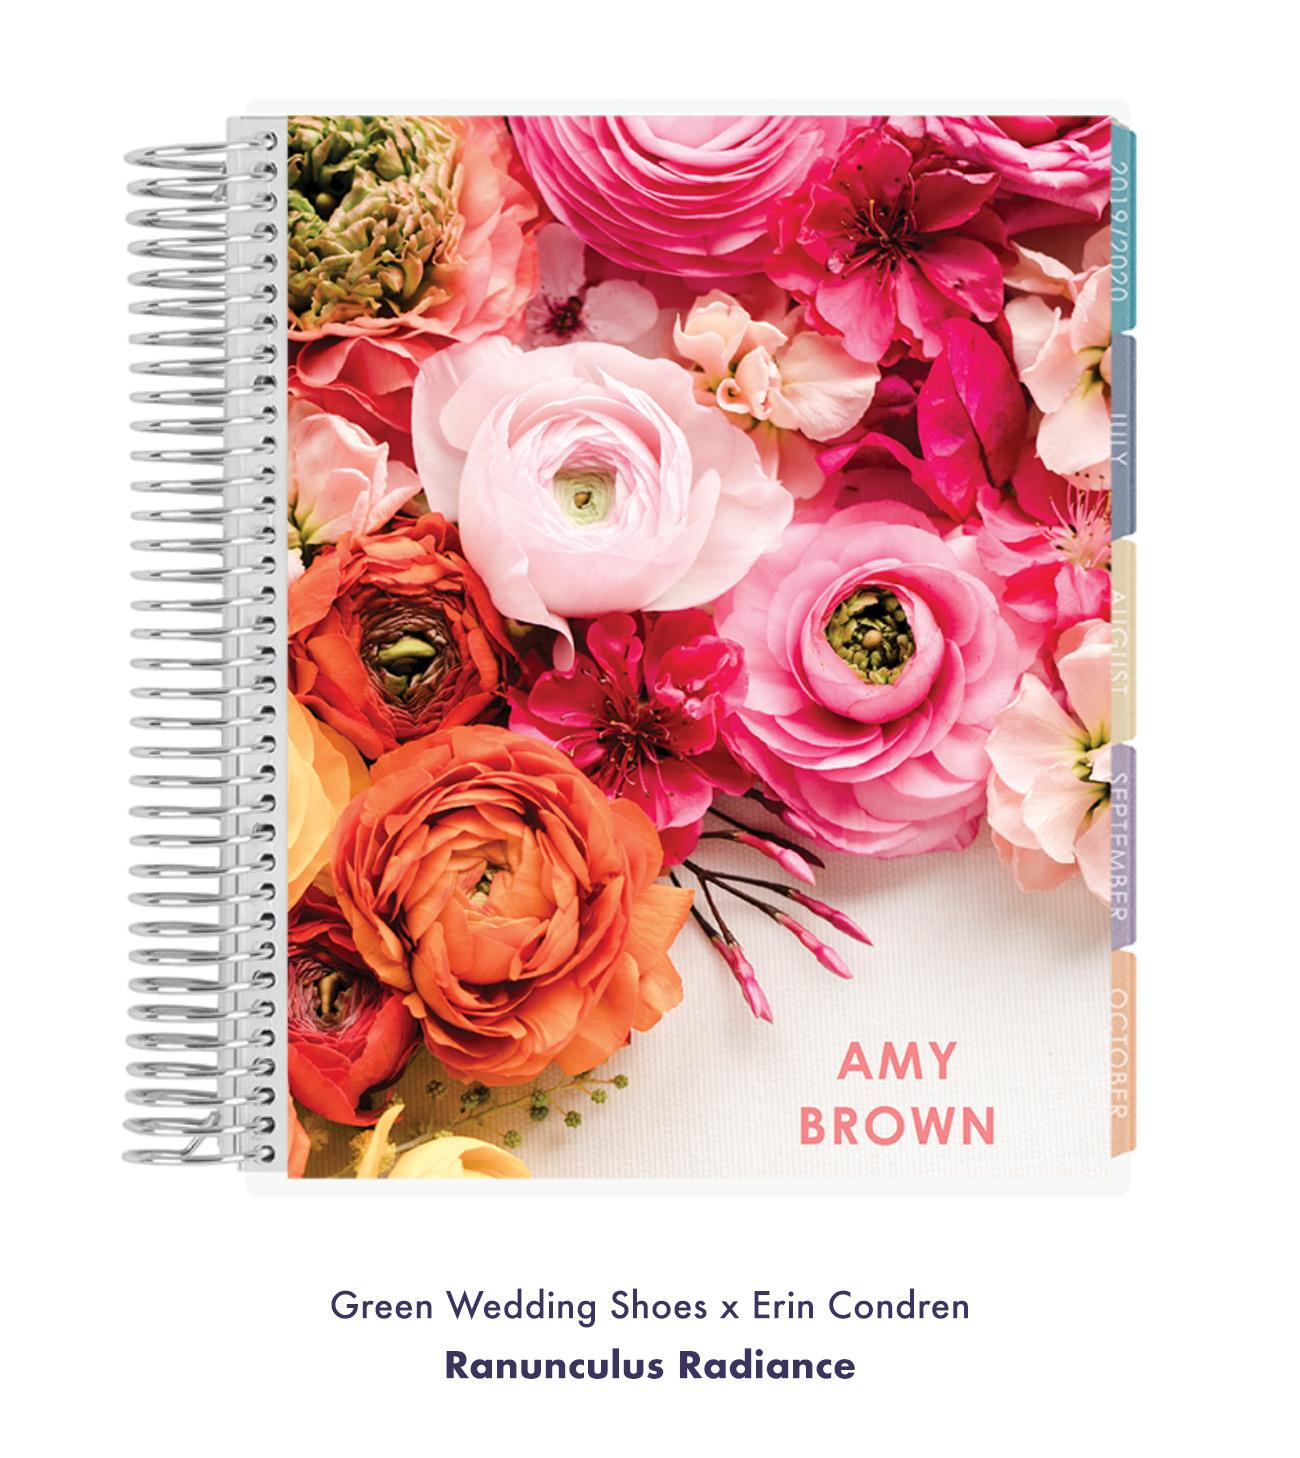 Green Wedding Shoes x Erin Condren Ranunculus Radiance Cover